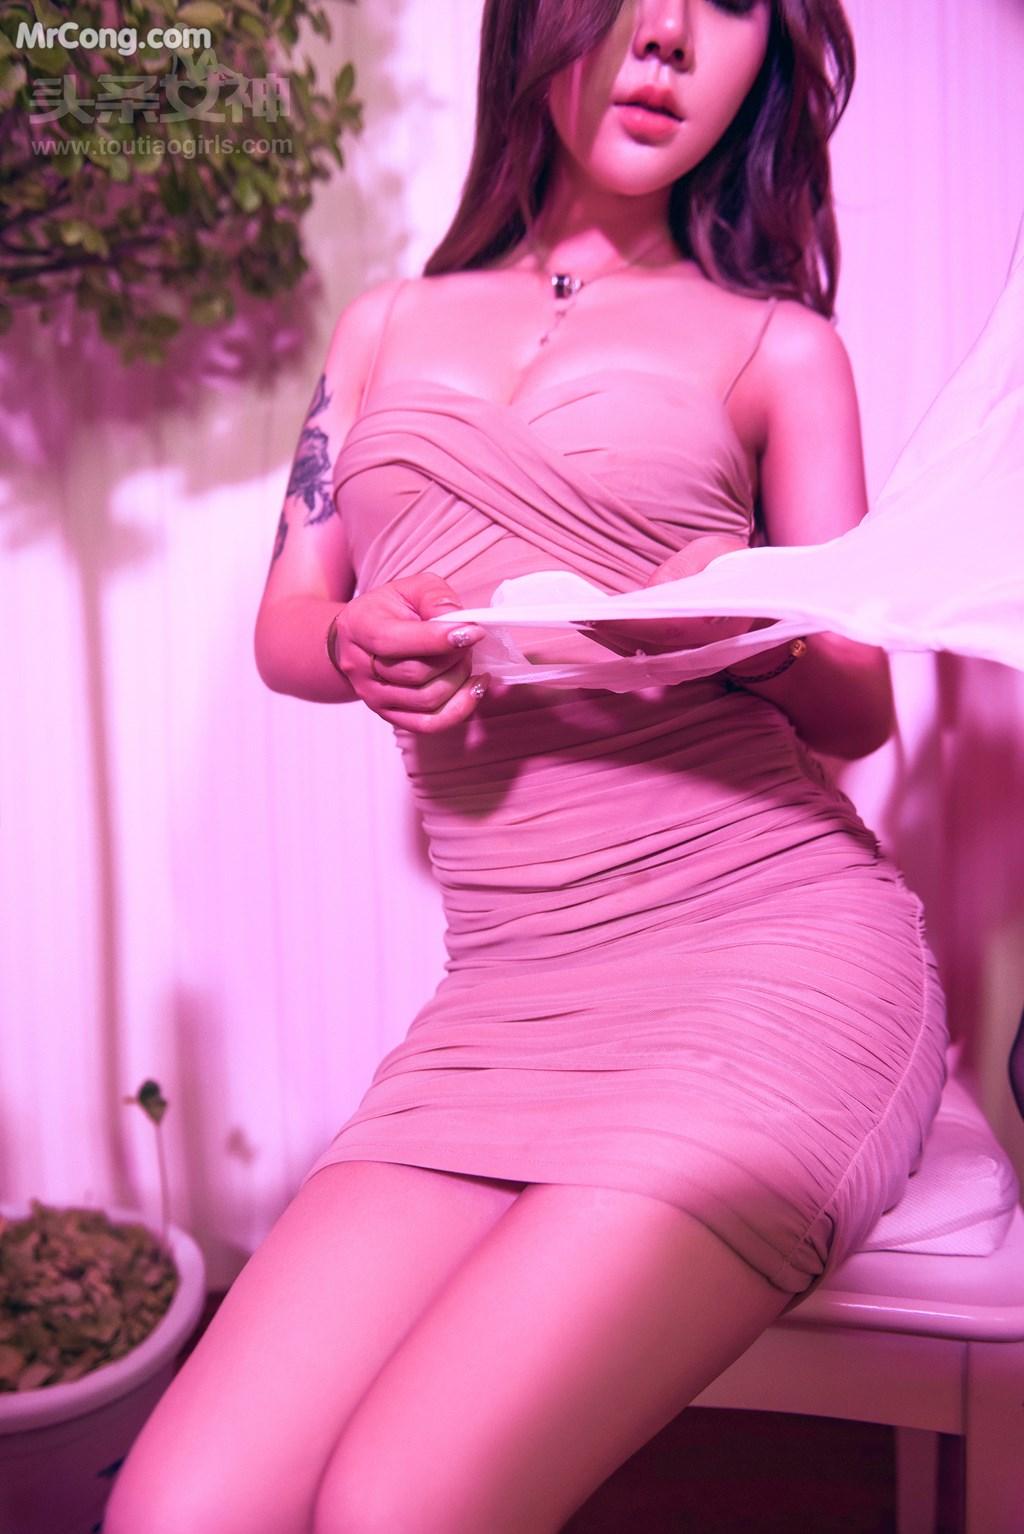 Image TouTiao-2017-08-18-Lisa-Aili-Sha--Jiu-Er-MrCong.com-009 in post TouTiao 2017-08-18: Người mẫu Lisa (爱丽莎) và Jiu Er (九儿) (52 ảnh)